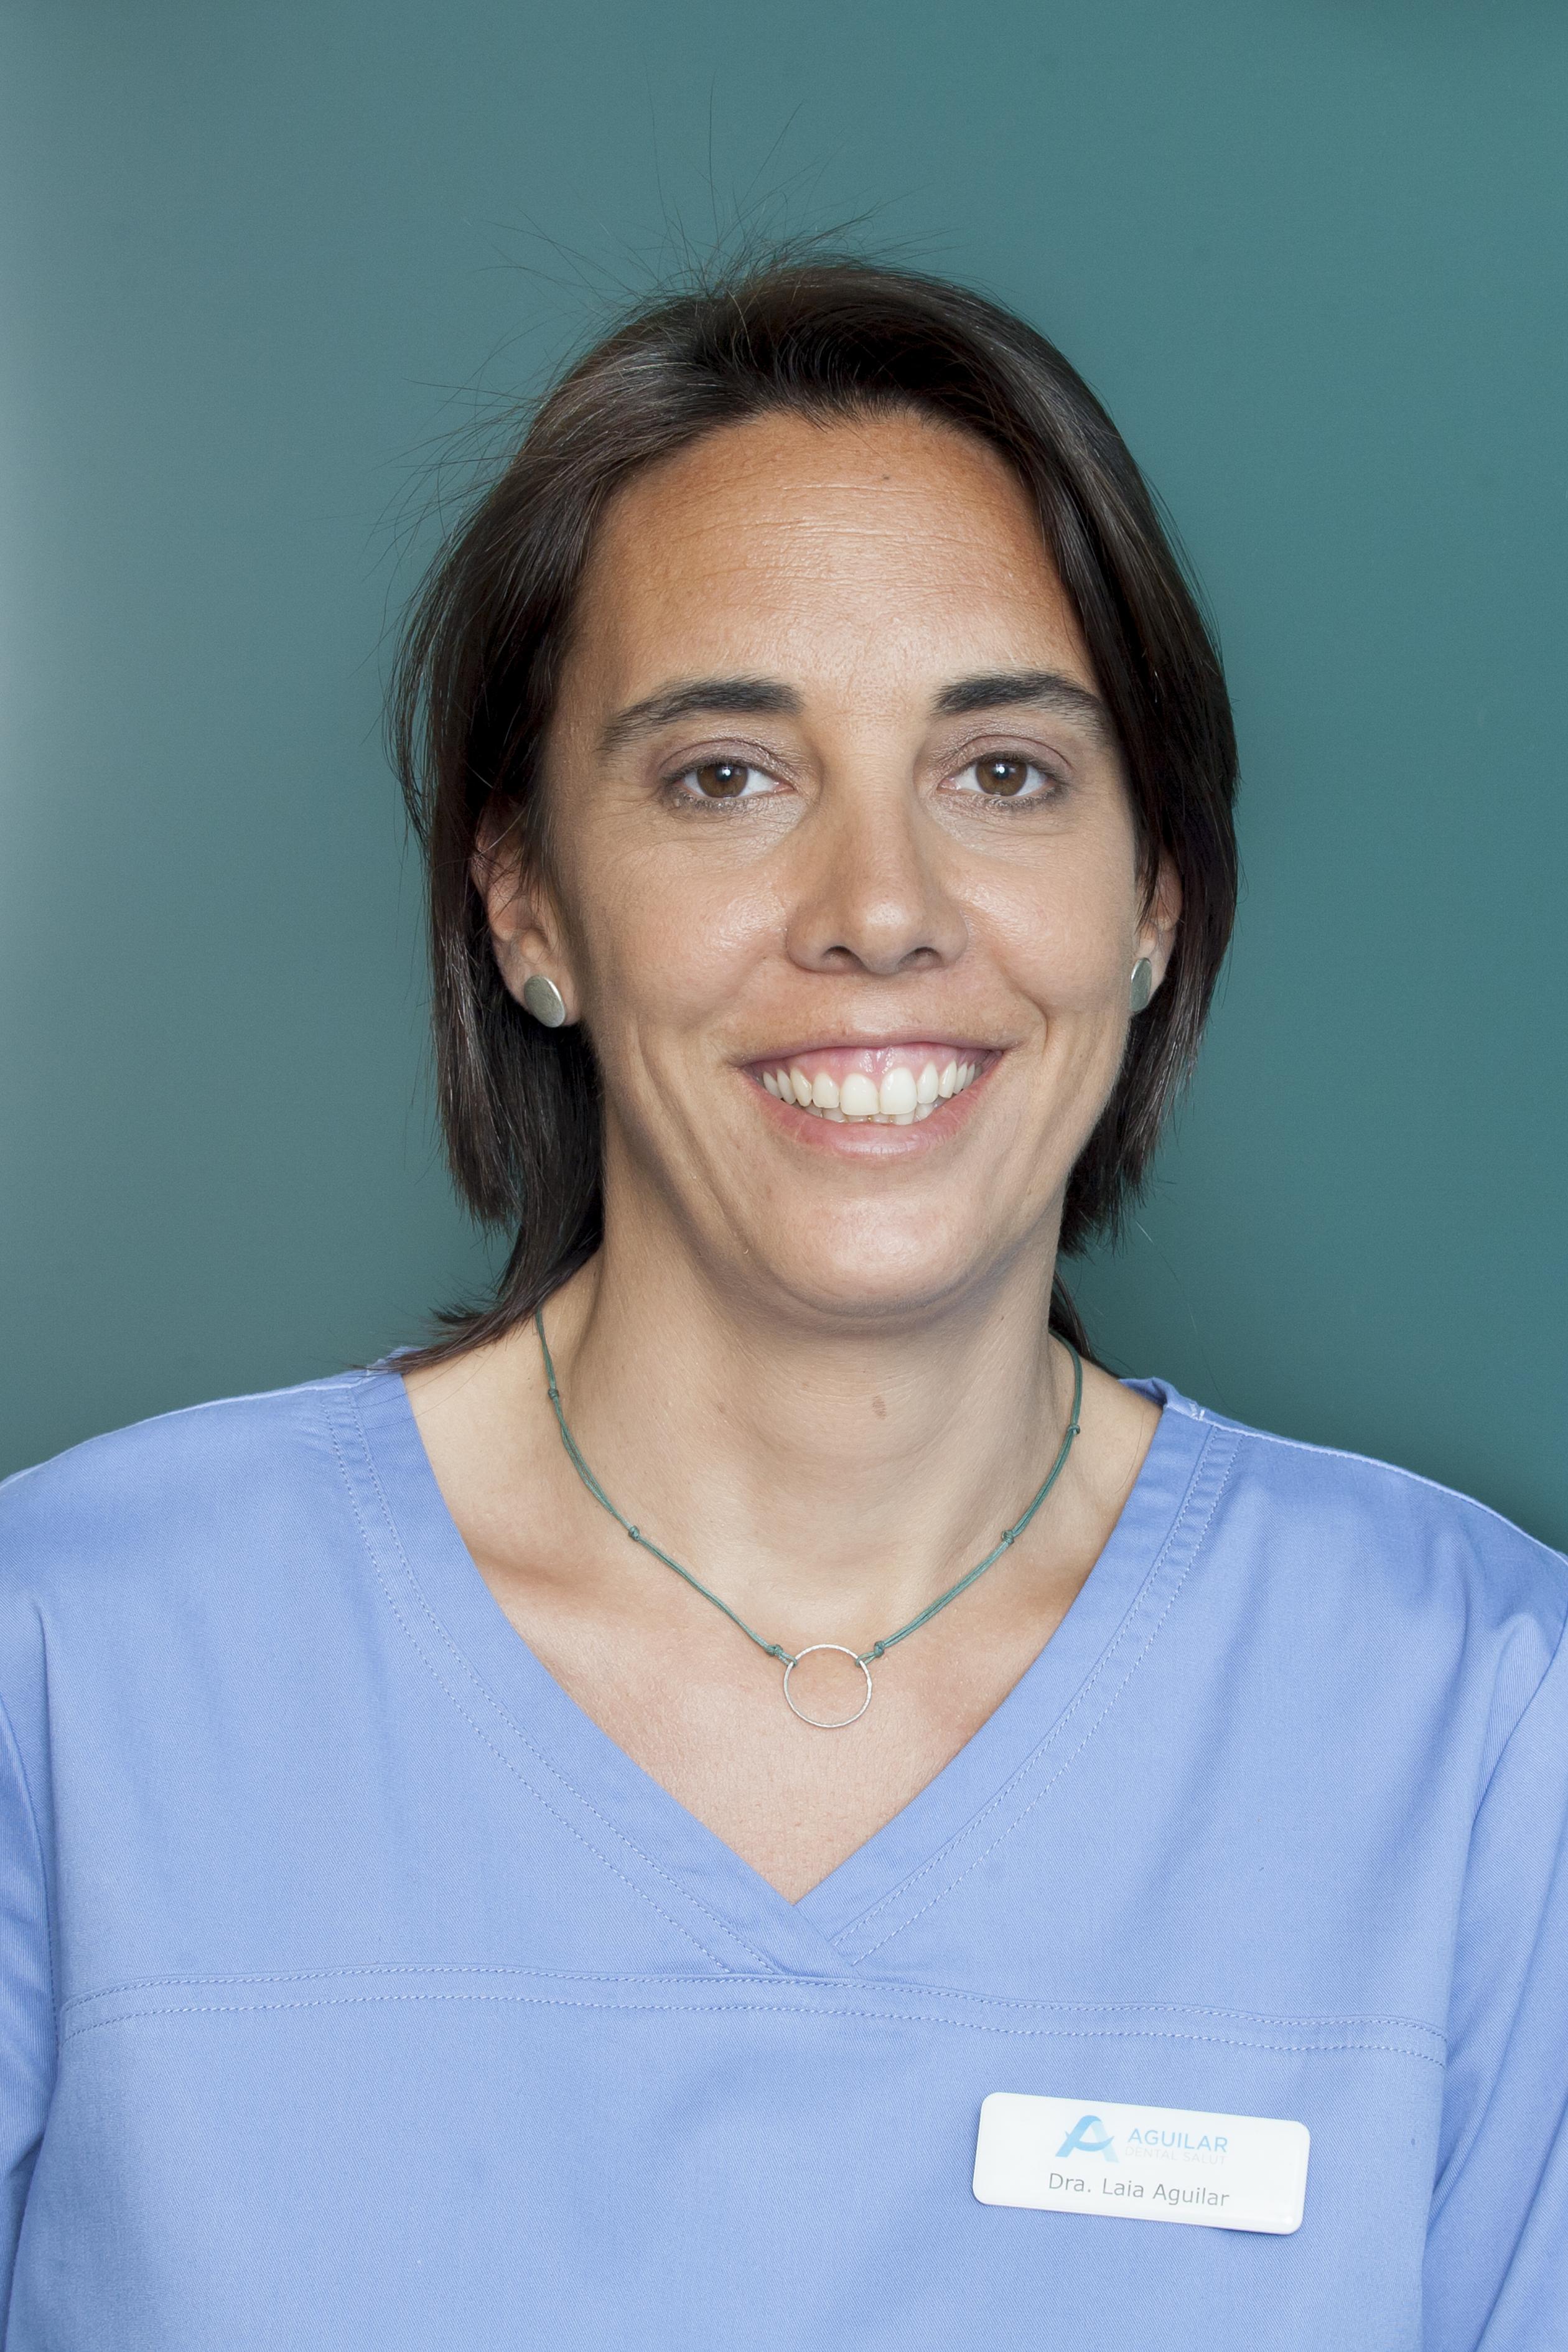 Dra. Laia Aguilar Almirall